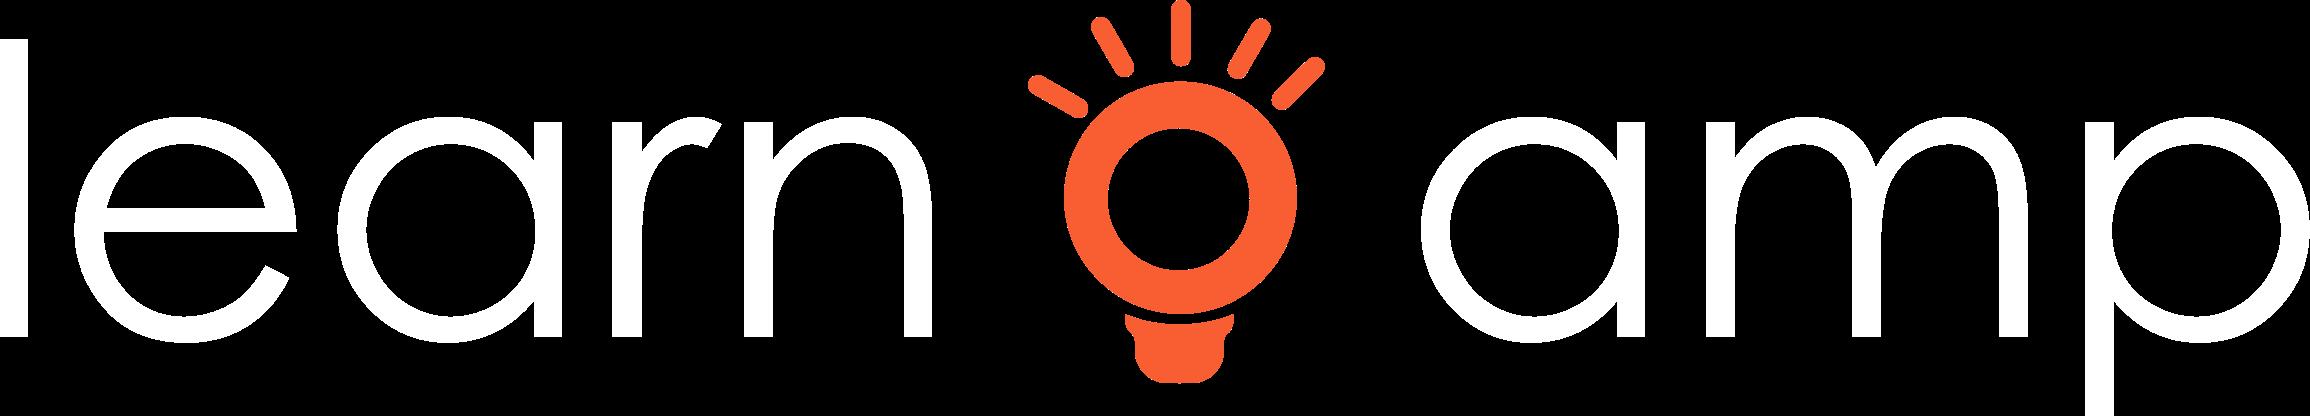 Learnamp logo hires